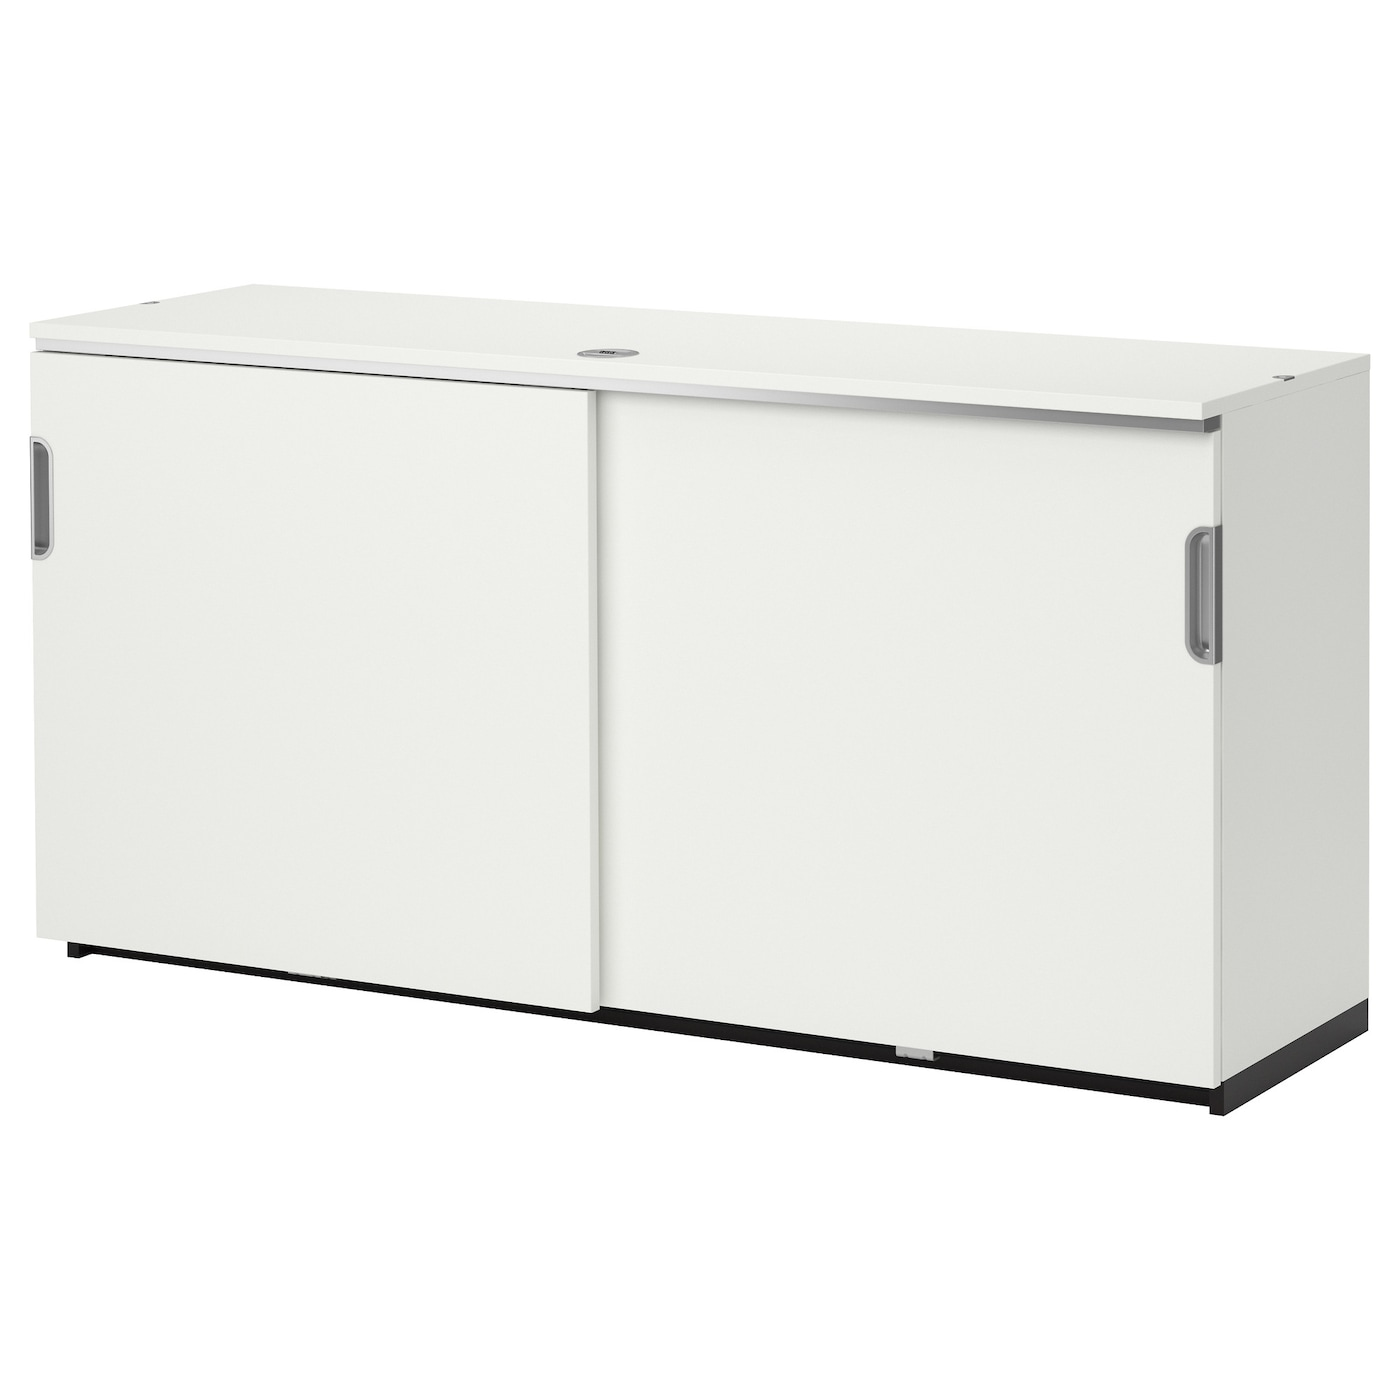 Galant Cabinet With Sliding Doors White 160x80 Cm Ikea